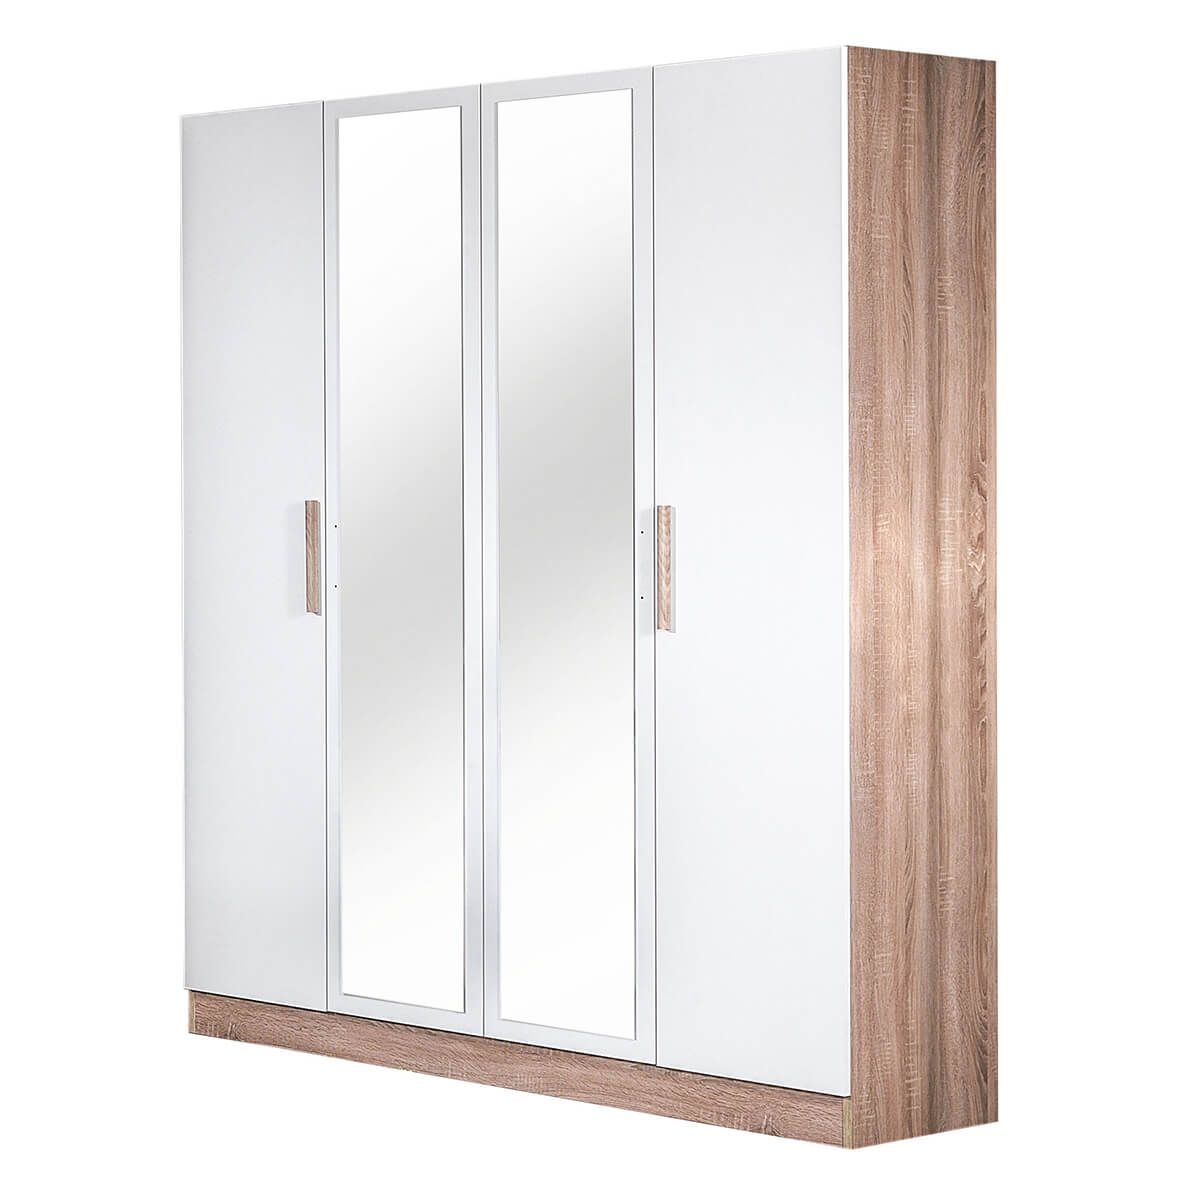 Armoire 4 Portes avec Miroir Central